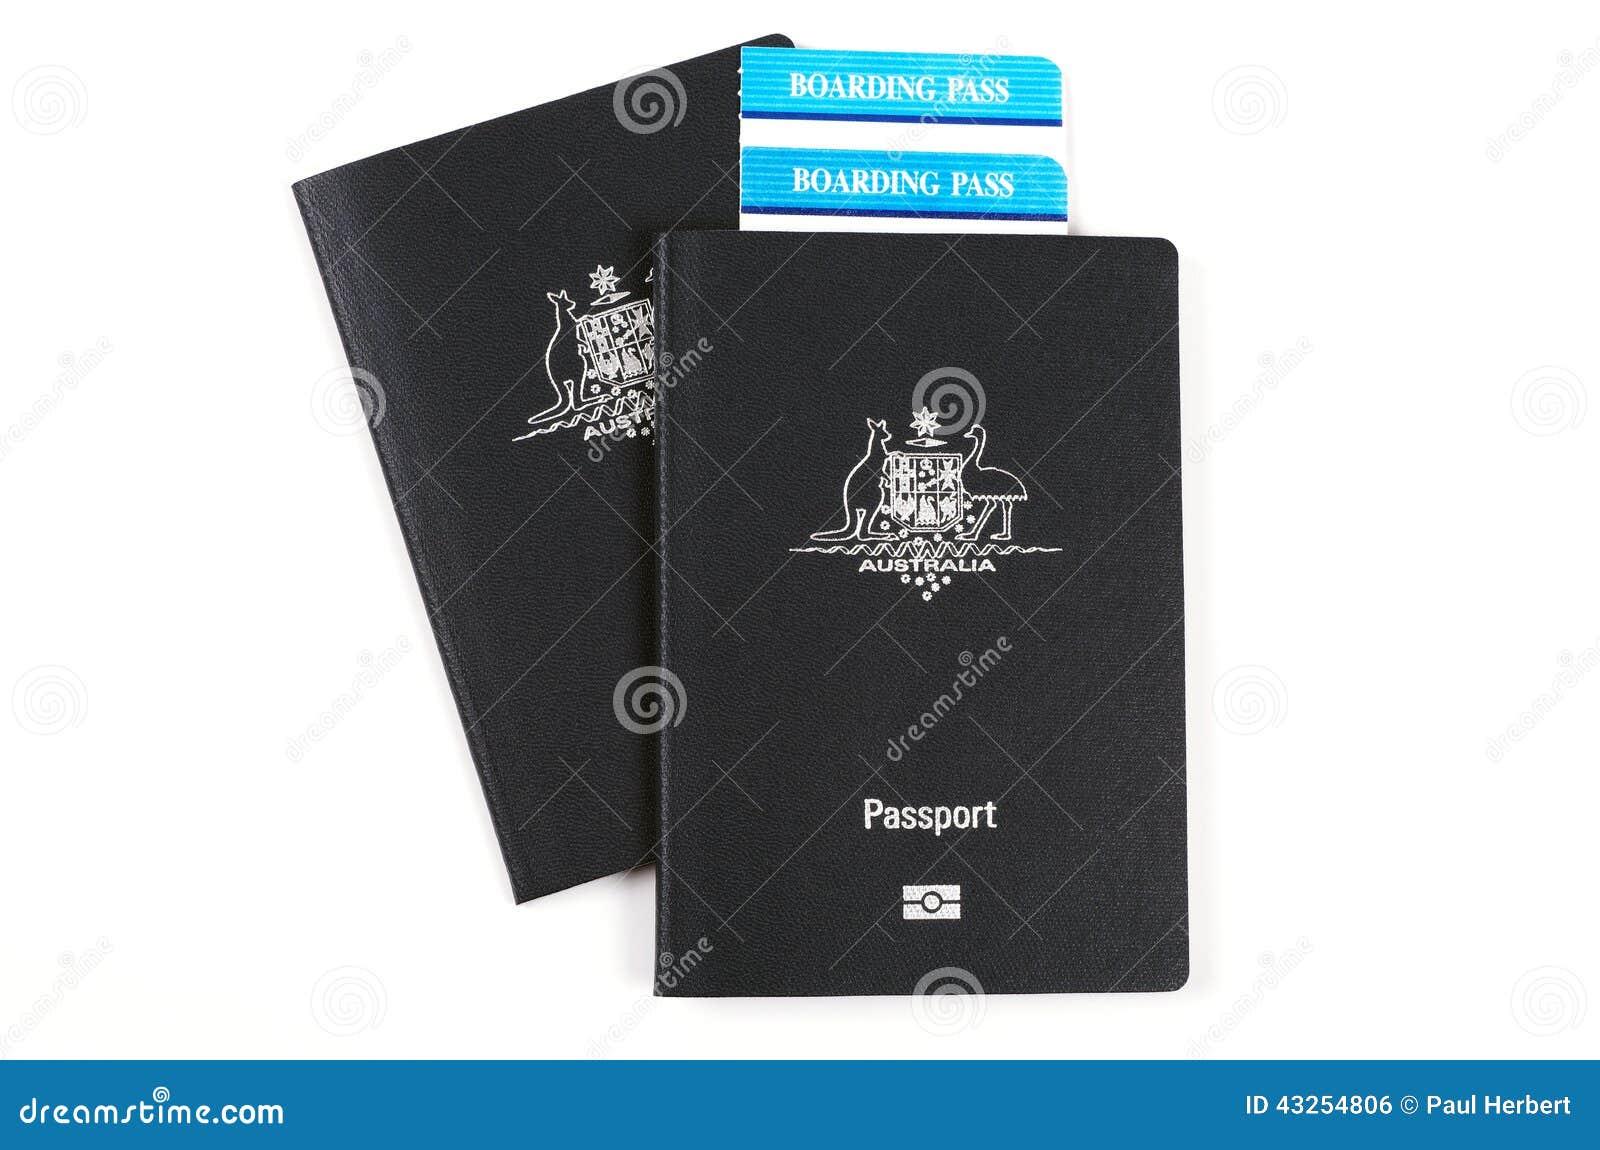 how to find passport number australia